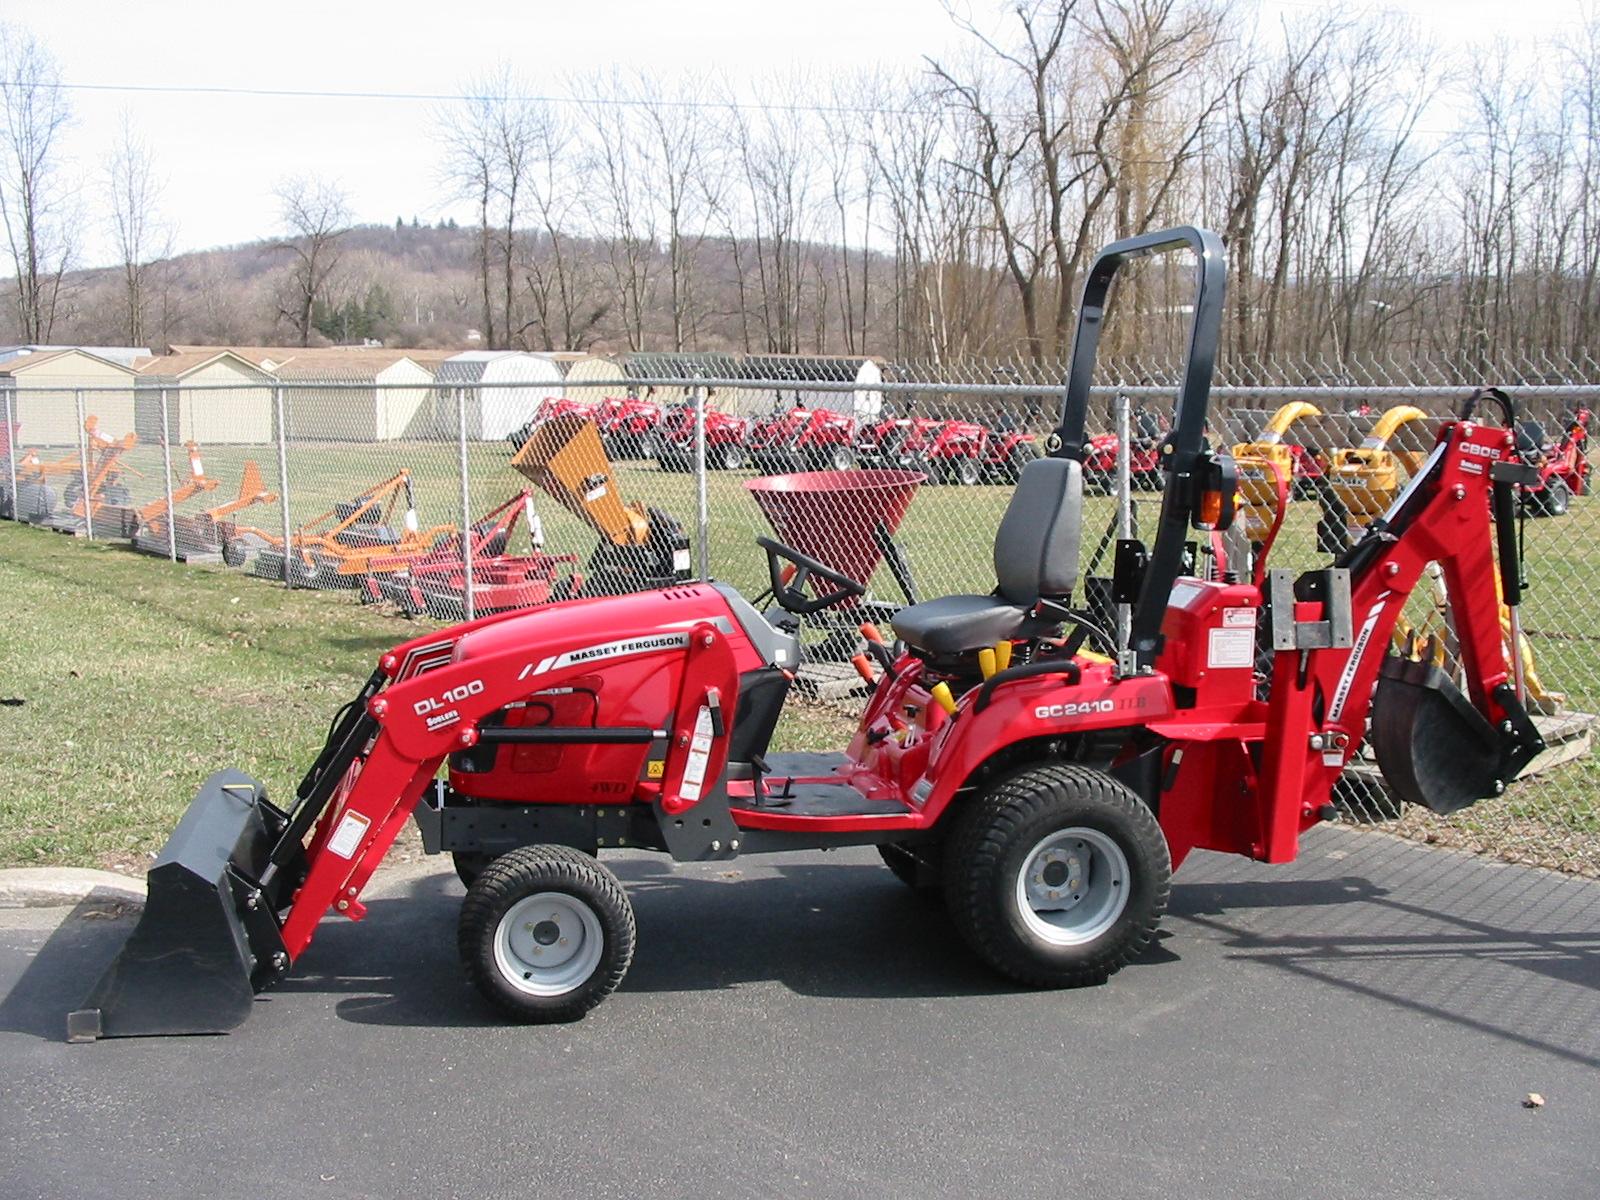 Massey Ferguson Tractor Loader Backhoe : Massey ferguson gc tractor loader backhoe iron